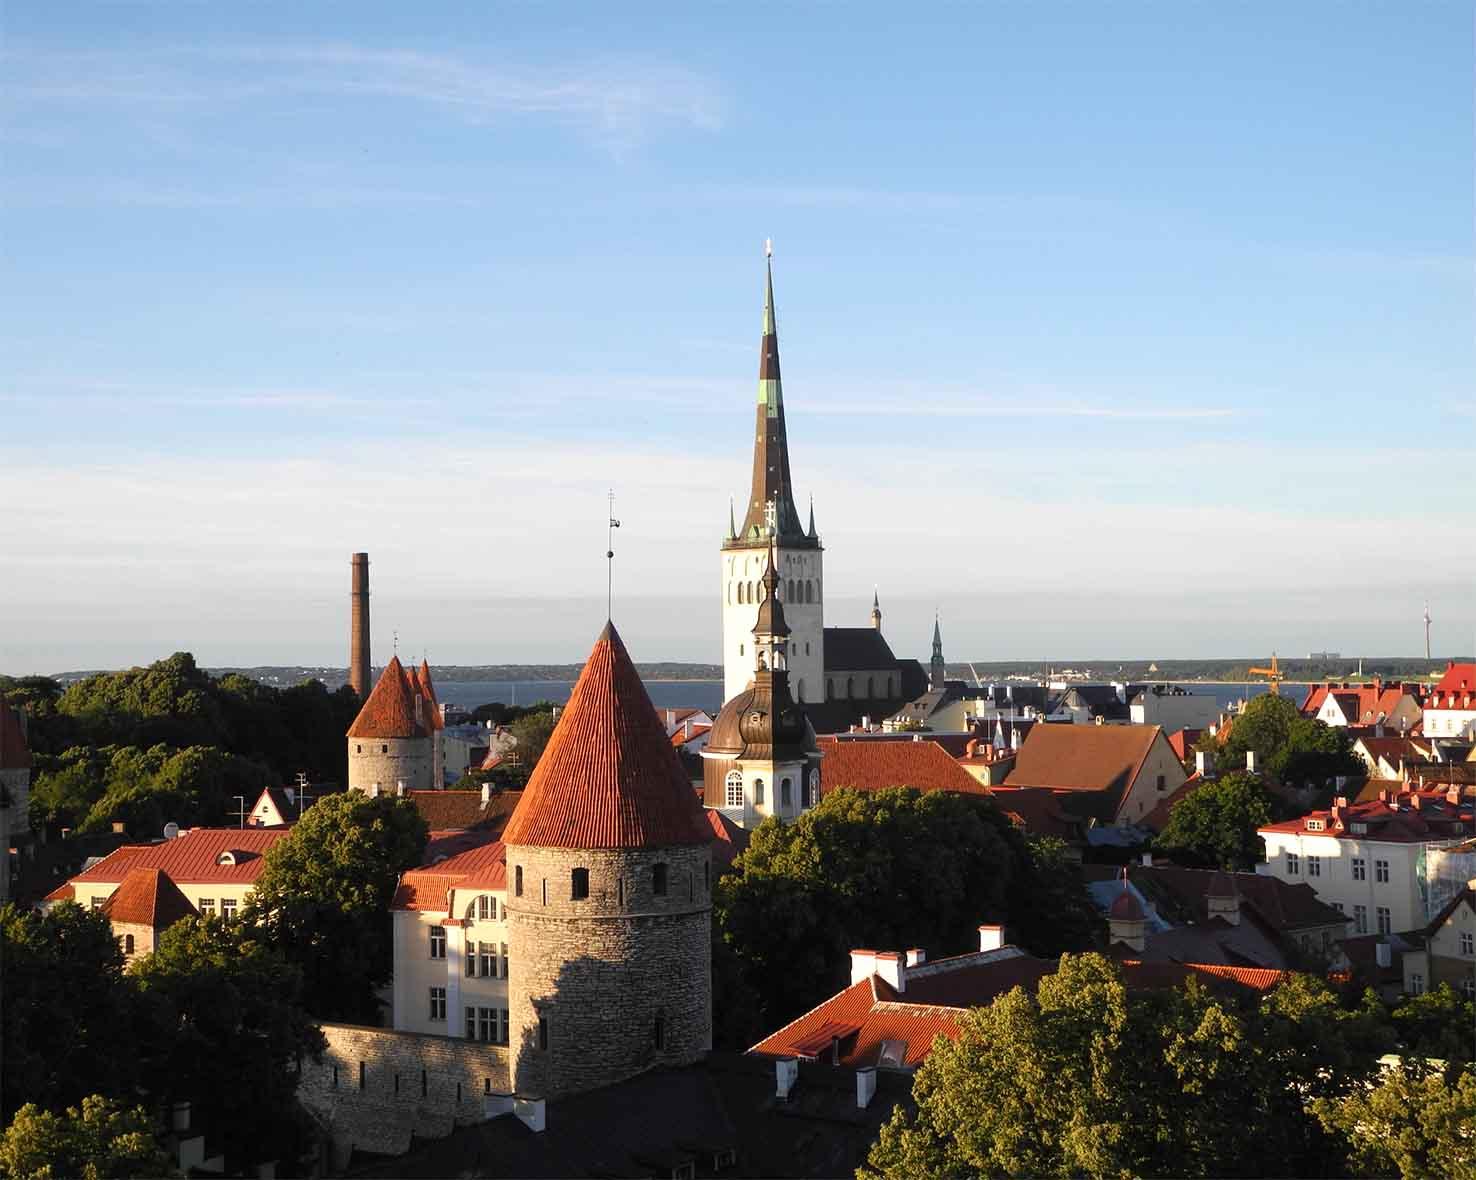 Radreise Baltikum, BNT, Fot. 4, P. Krawczyński